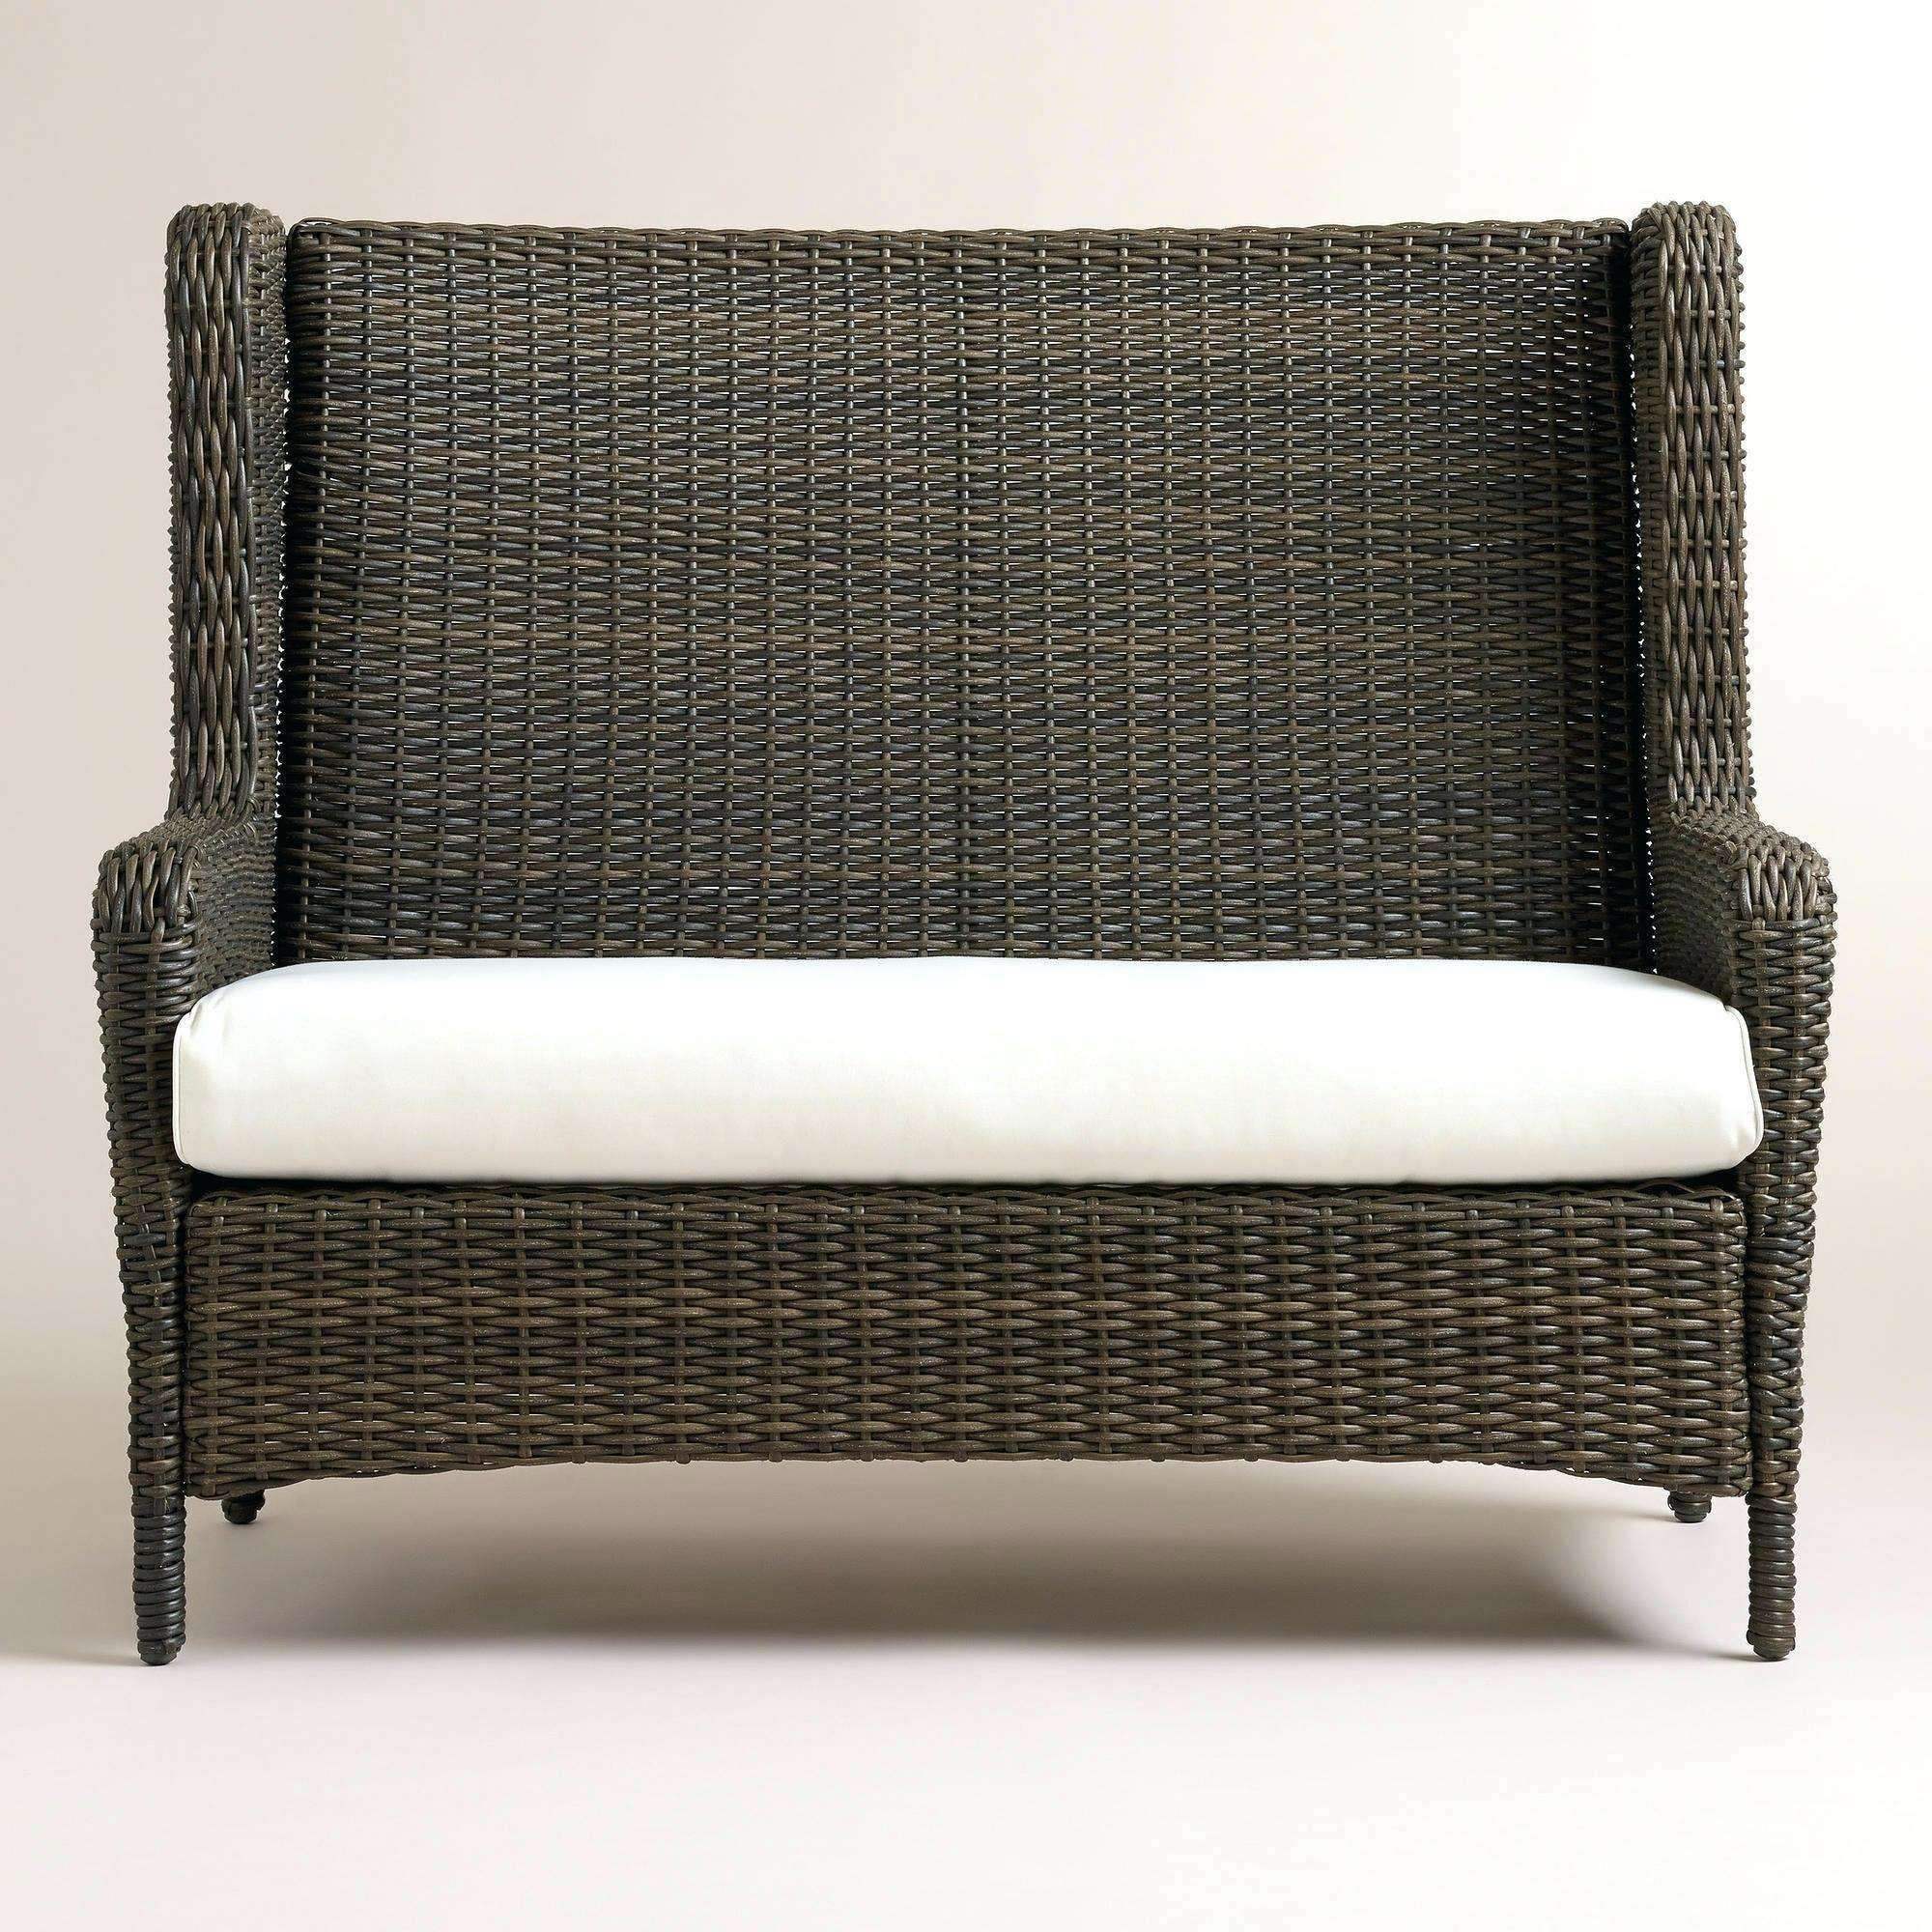 Wohnlandschaft In U Form Xxl Wohnlandschaft Poco Von Poco Eckcouch Elegant Lounge Sofa Poco Patio Cushions Clearance Patio Furniture Outdoor Chair Cushions